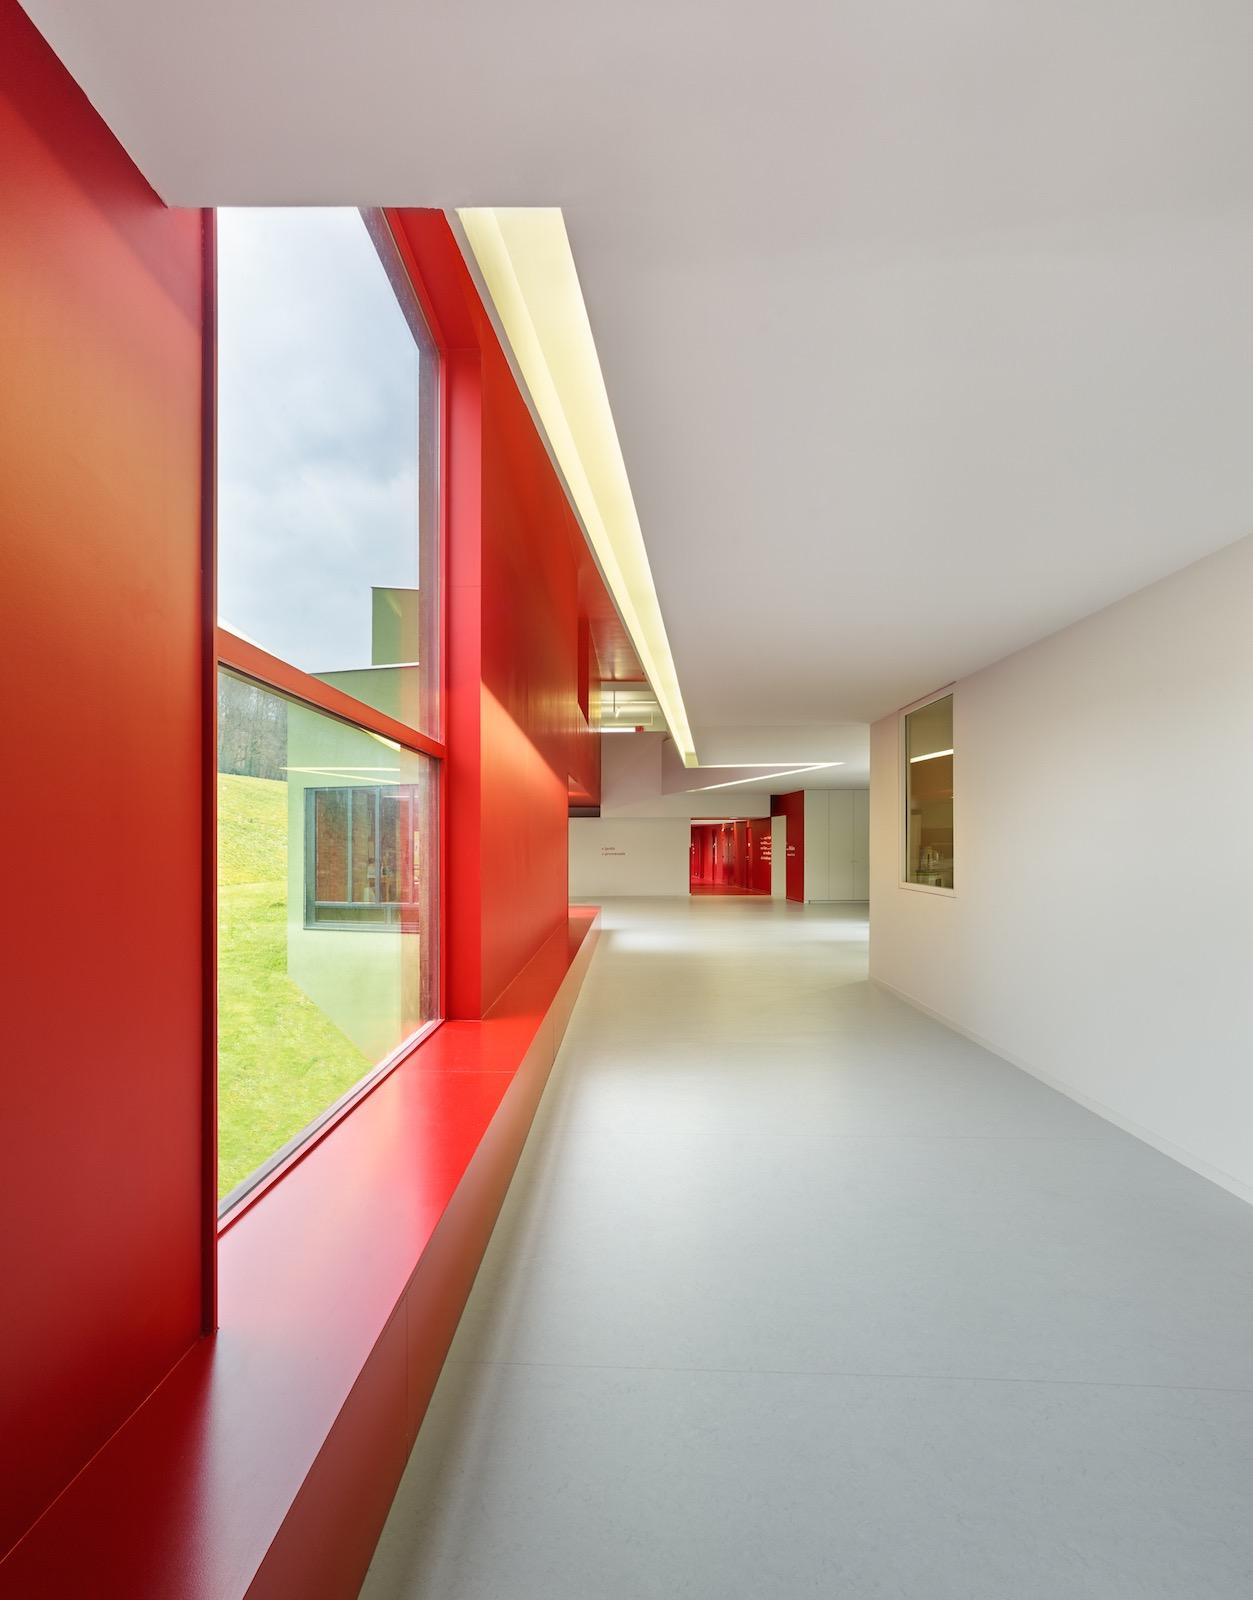 architecture_orbec_dominiquecoulon_associesarchitectes_08